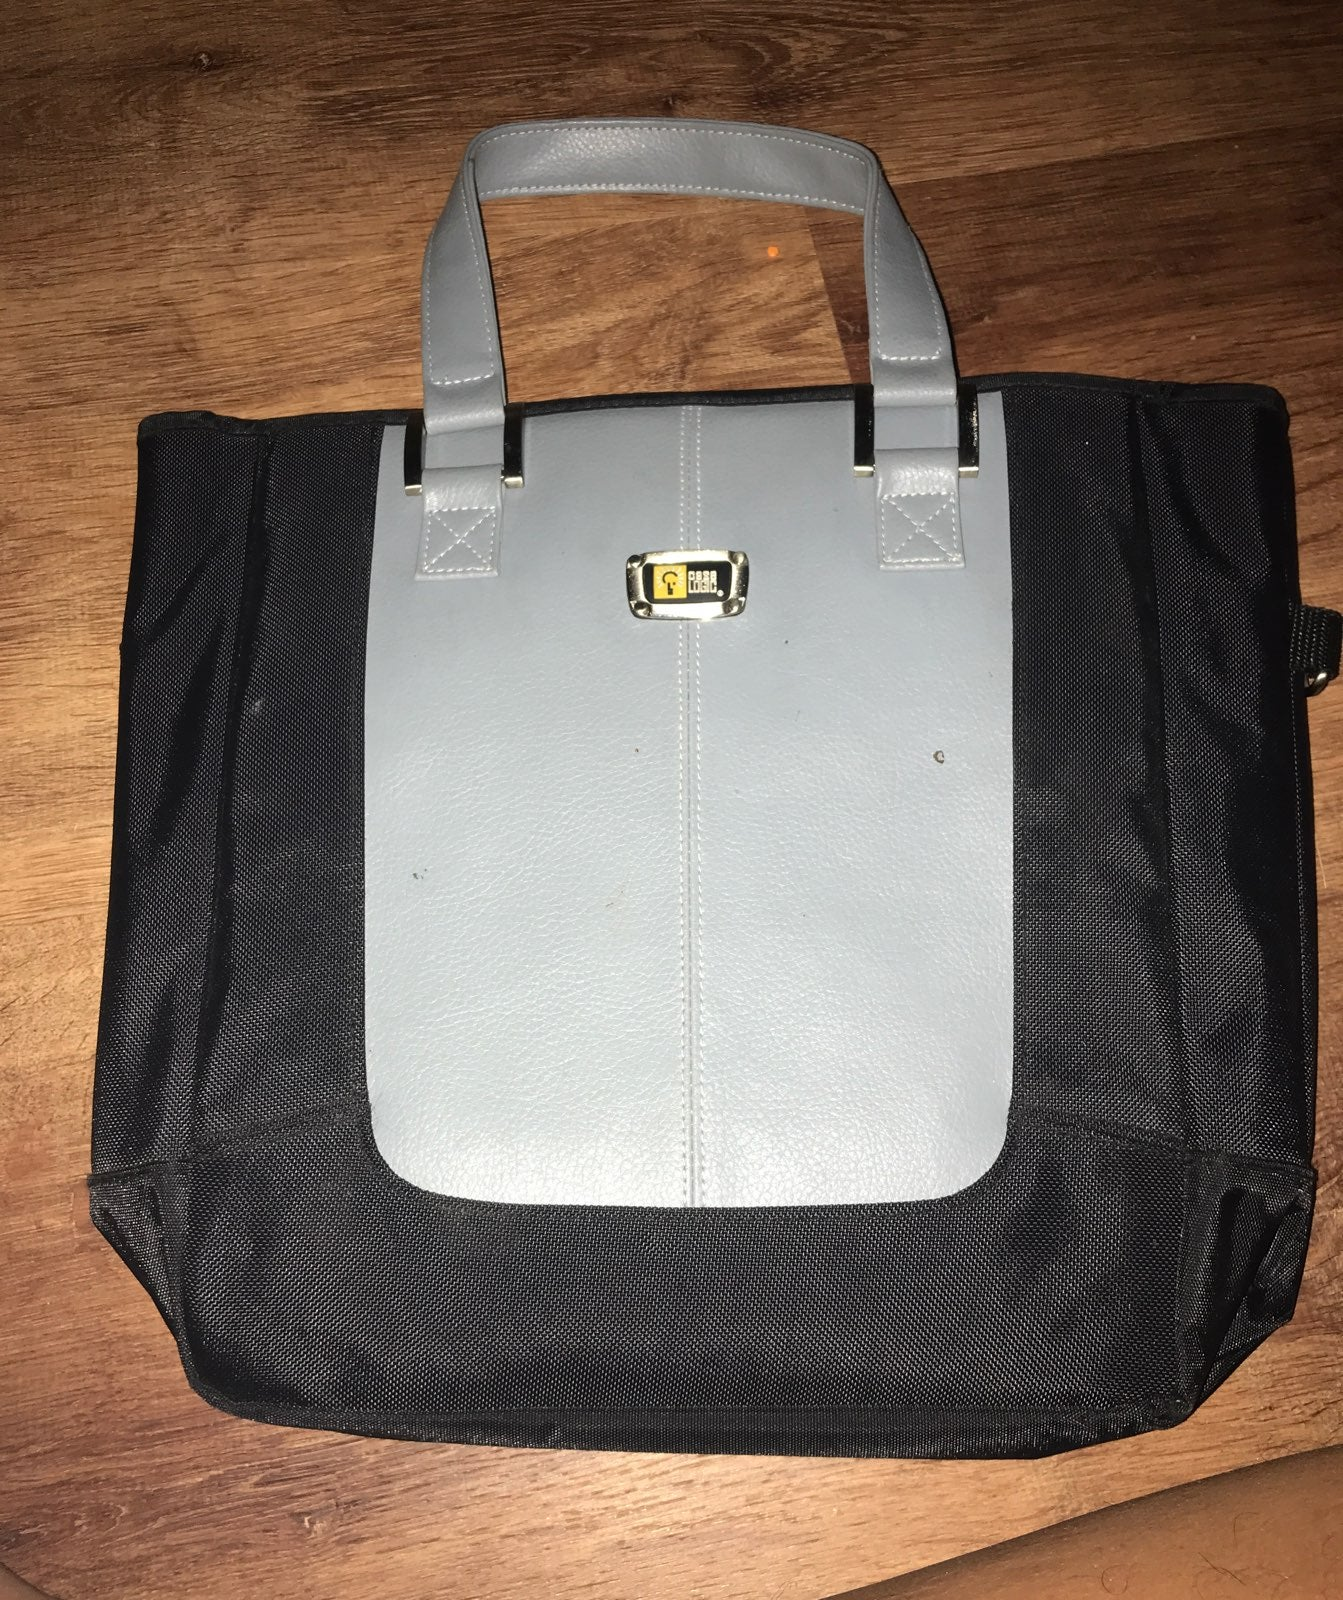 CaseLogic Black Laptop Sleeve like new